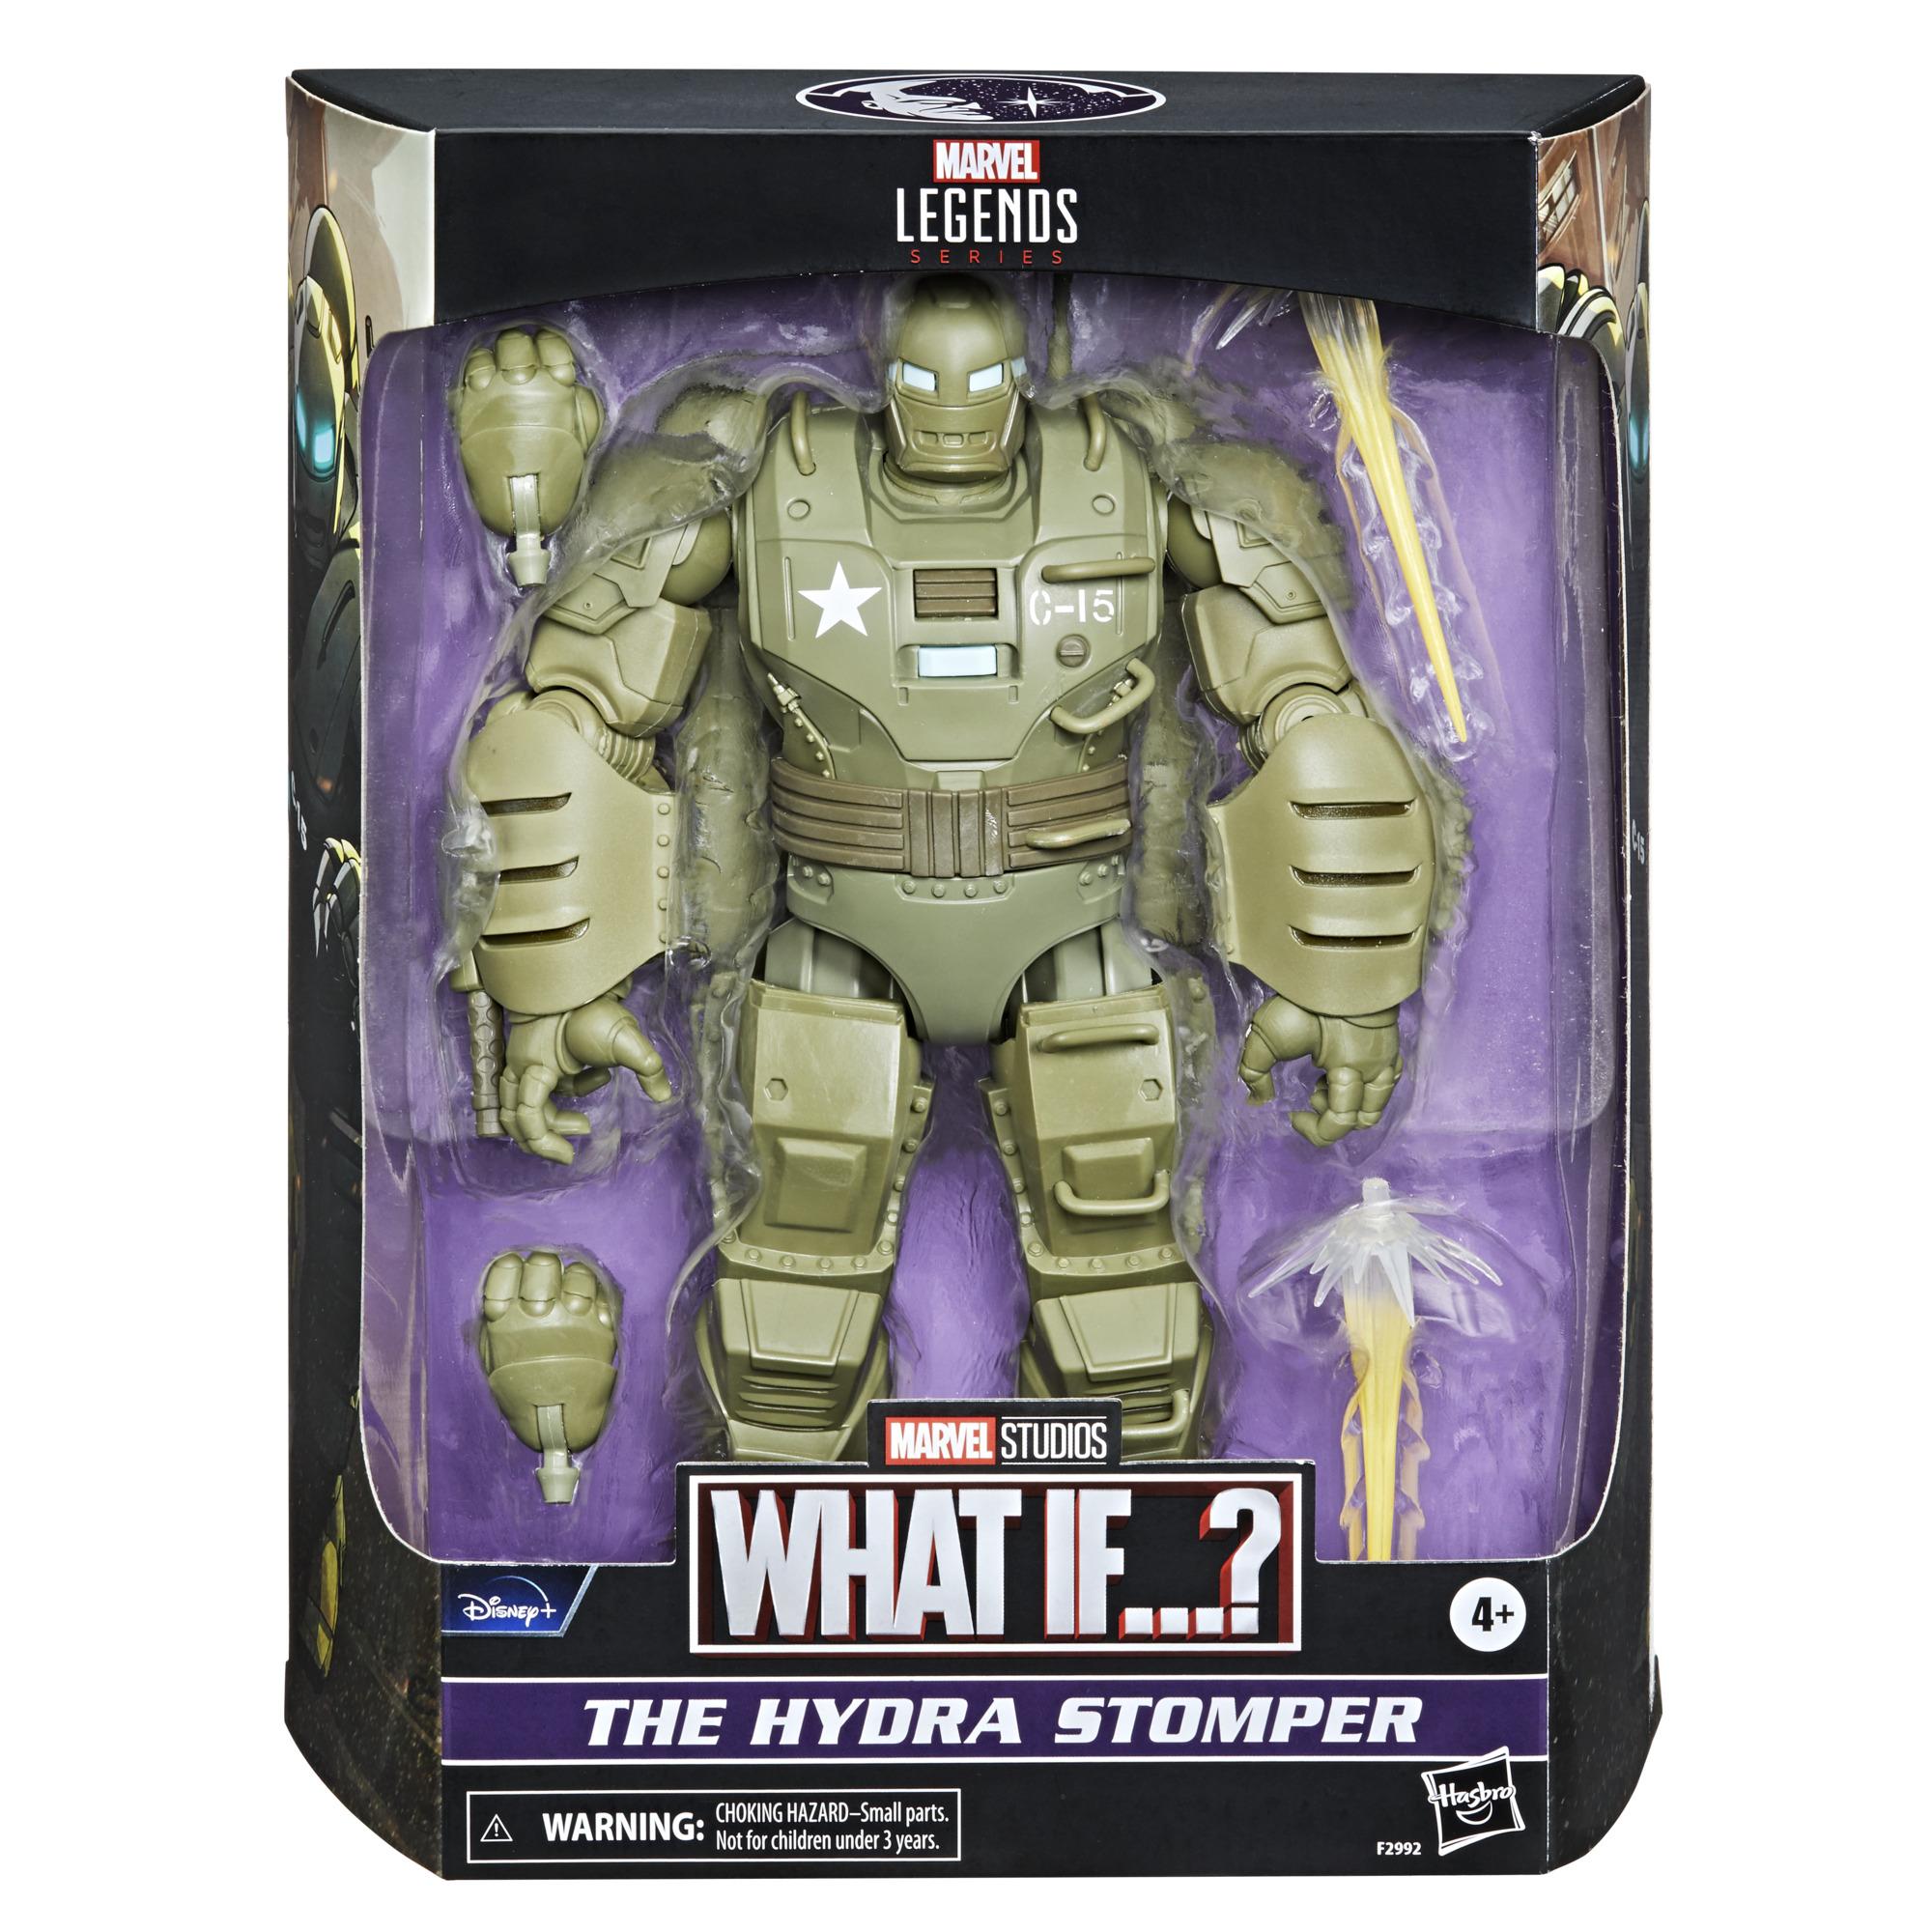 Marvel Legends Series Hydra Stomper Deluxe  15 cm F29925L00 5010993843138